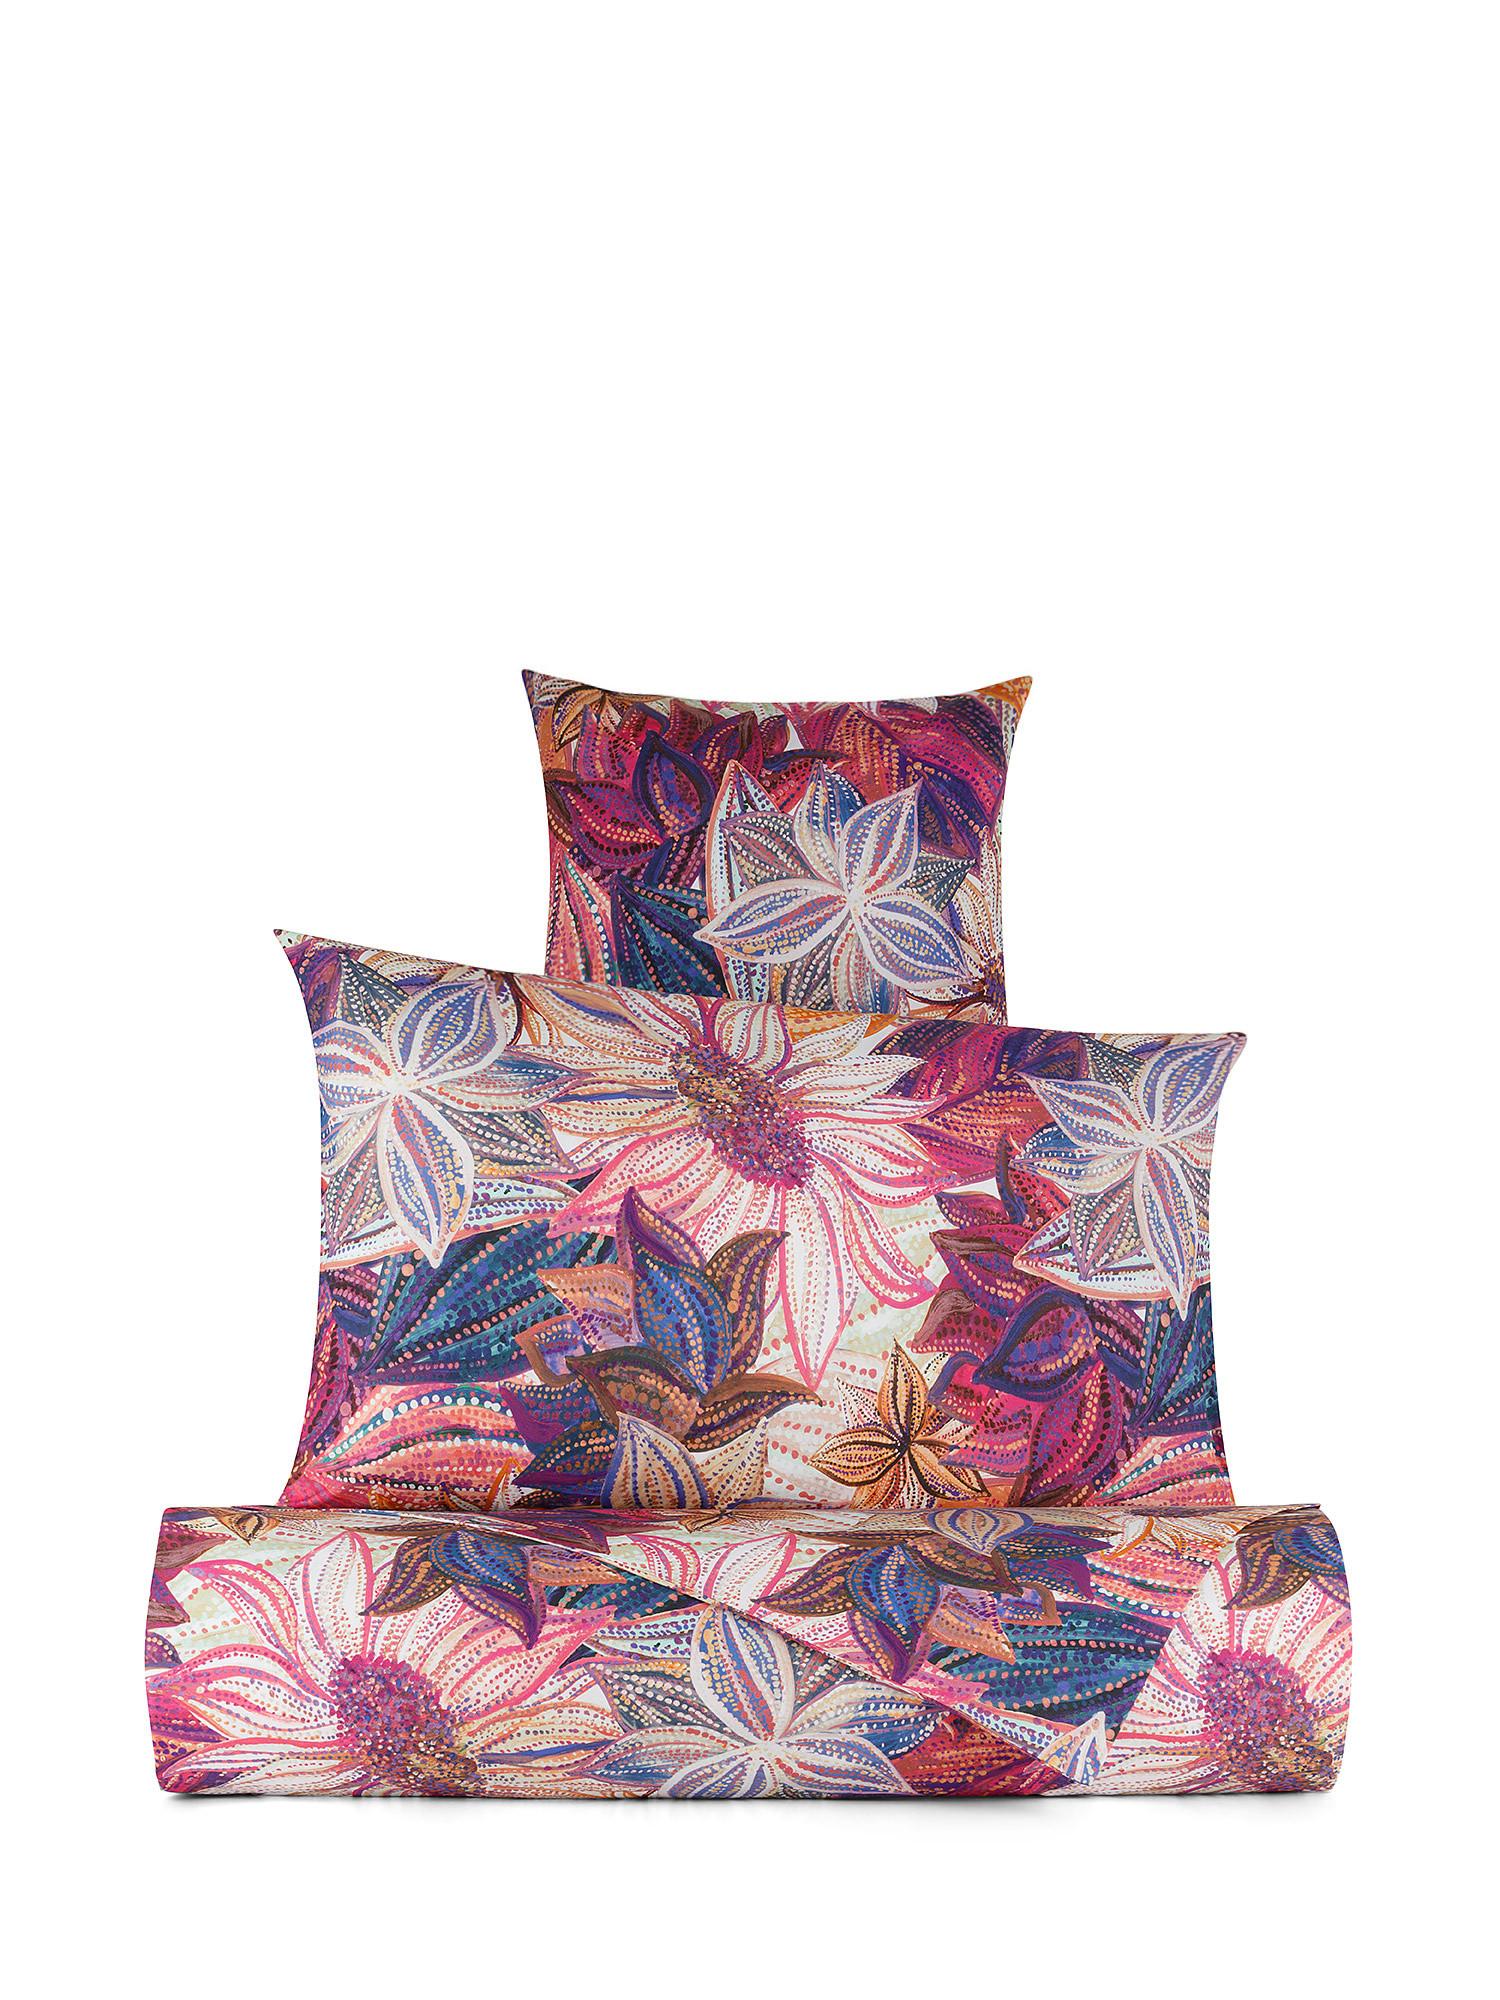 Copripiumino cotone percalle fantasia floreale, Multicolor, large image number 0